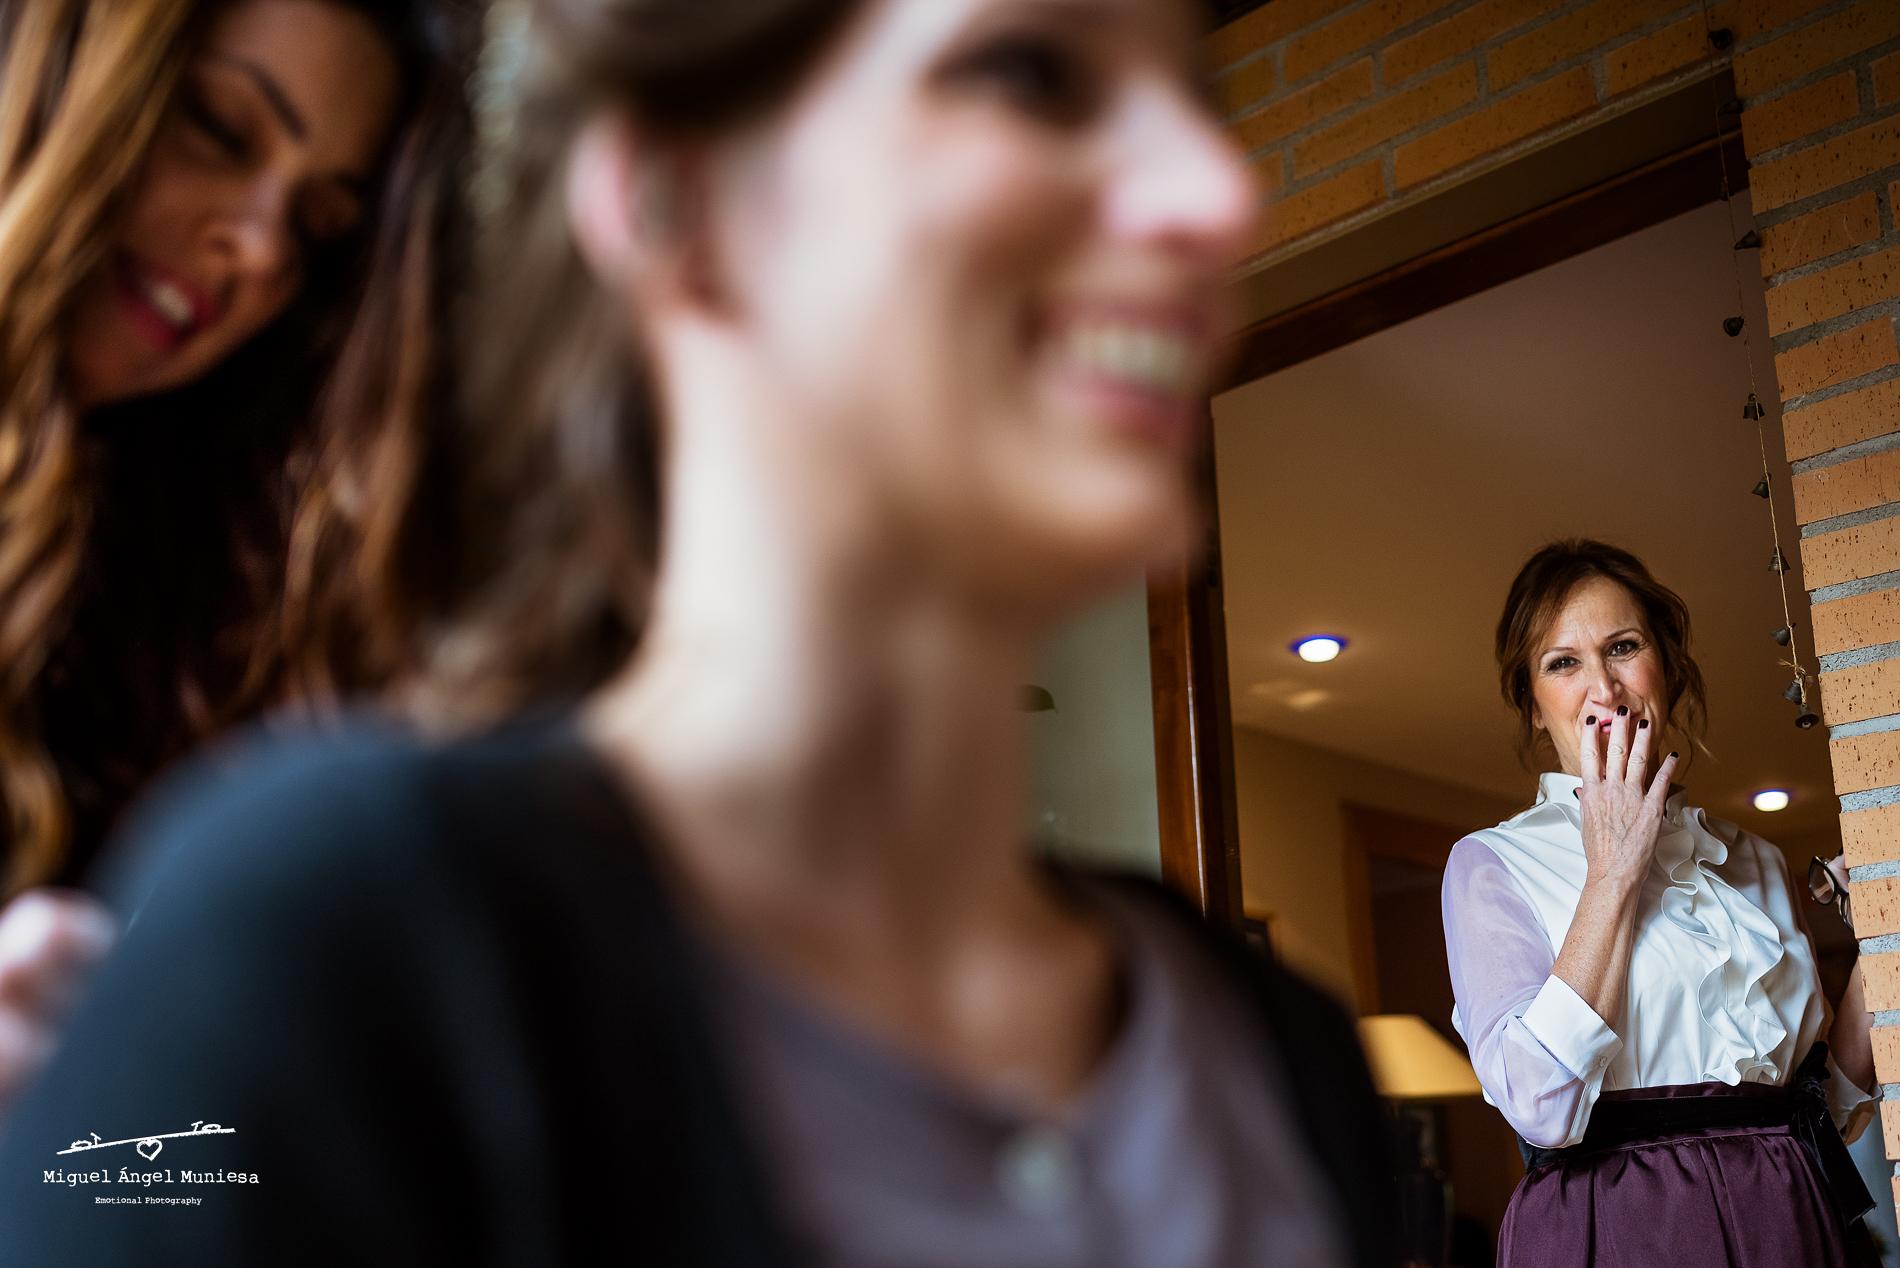 miguel angel muniesa, fotografo boda Teruel, fotografo boda navarra, fotografo boda zaragoza, fotografo boda soria, miguel angel muniesa emotional photography_03